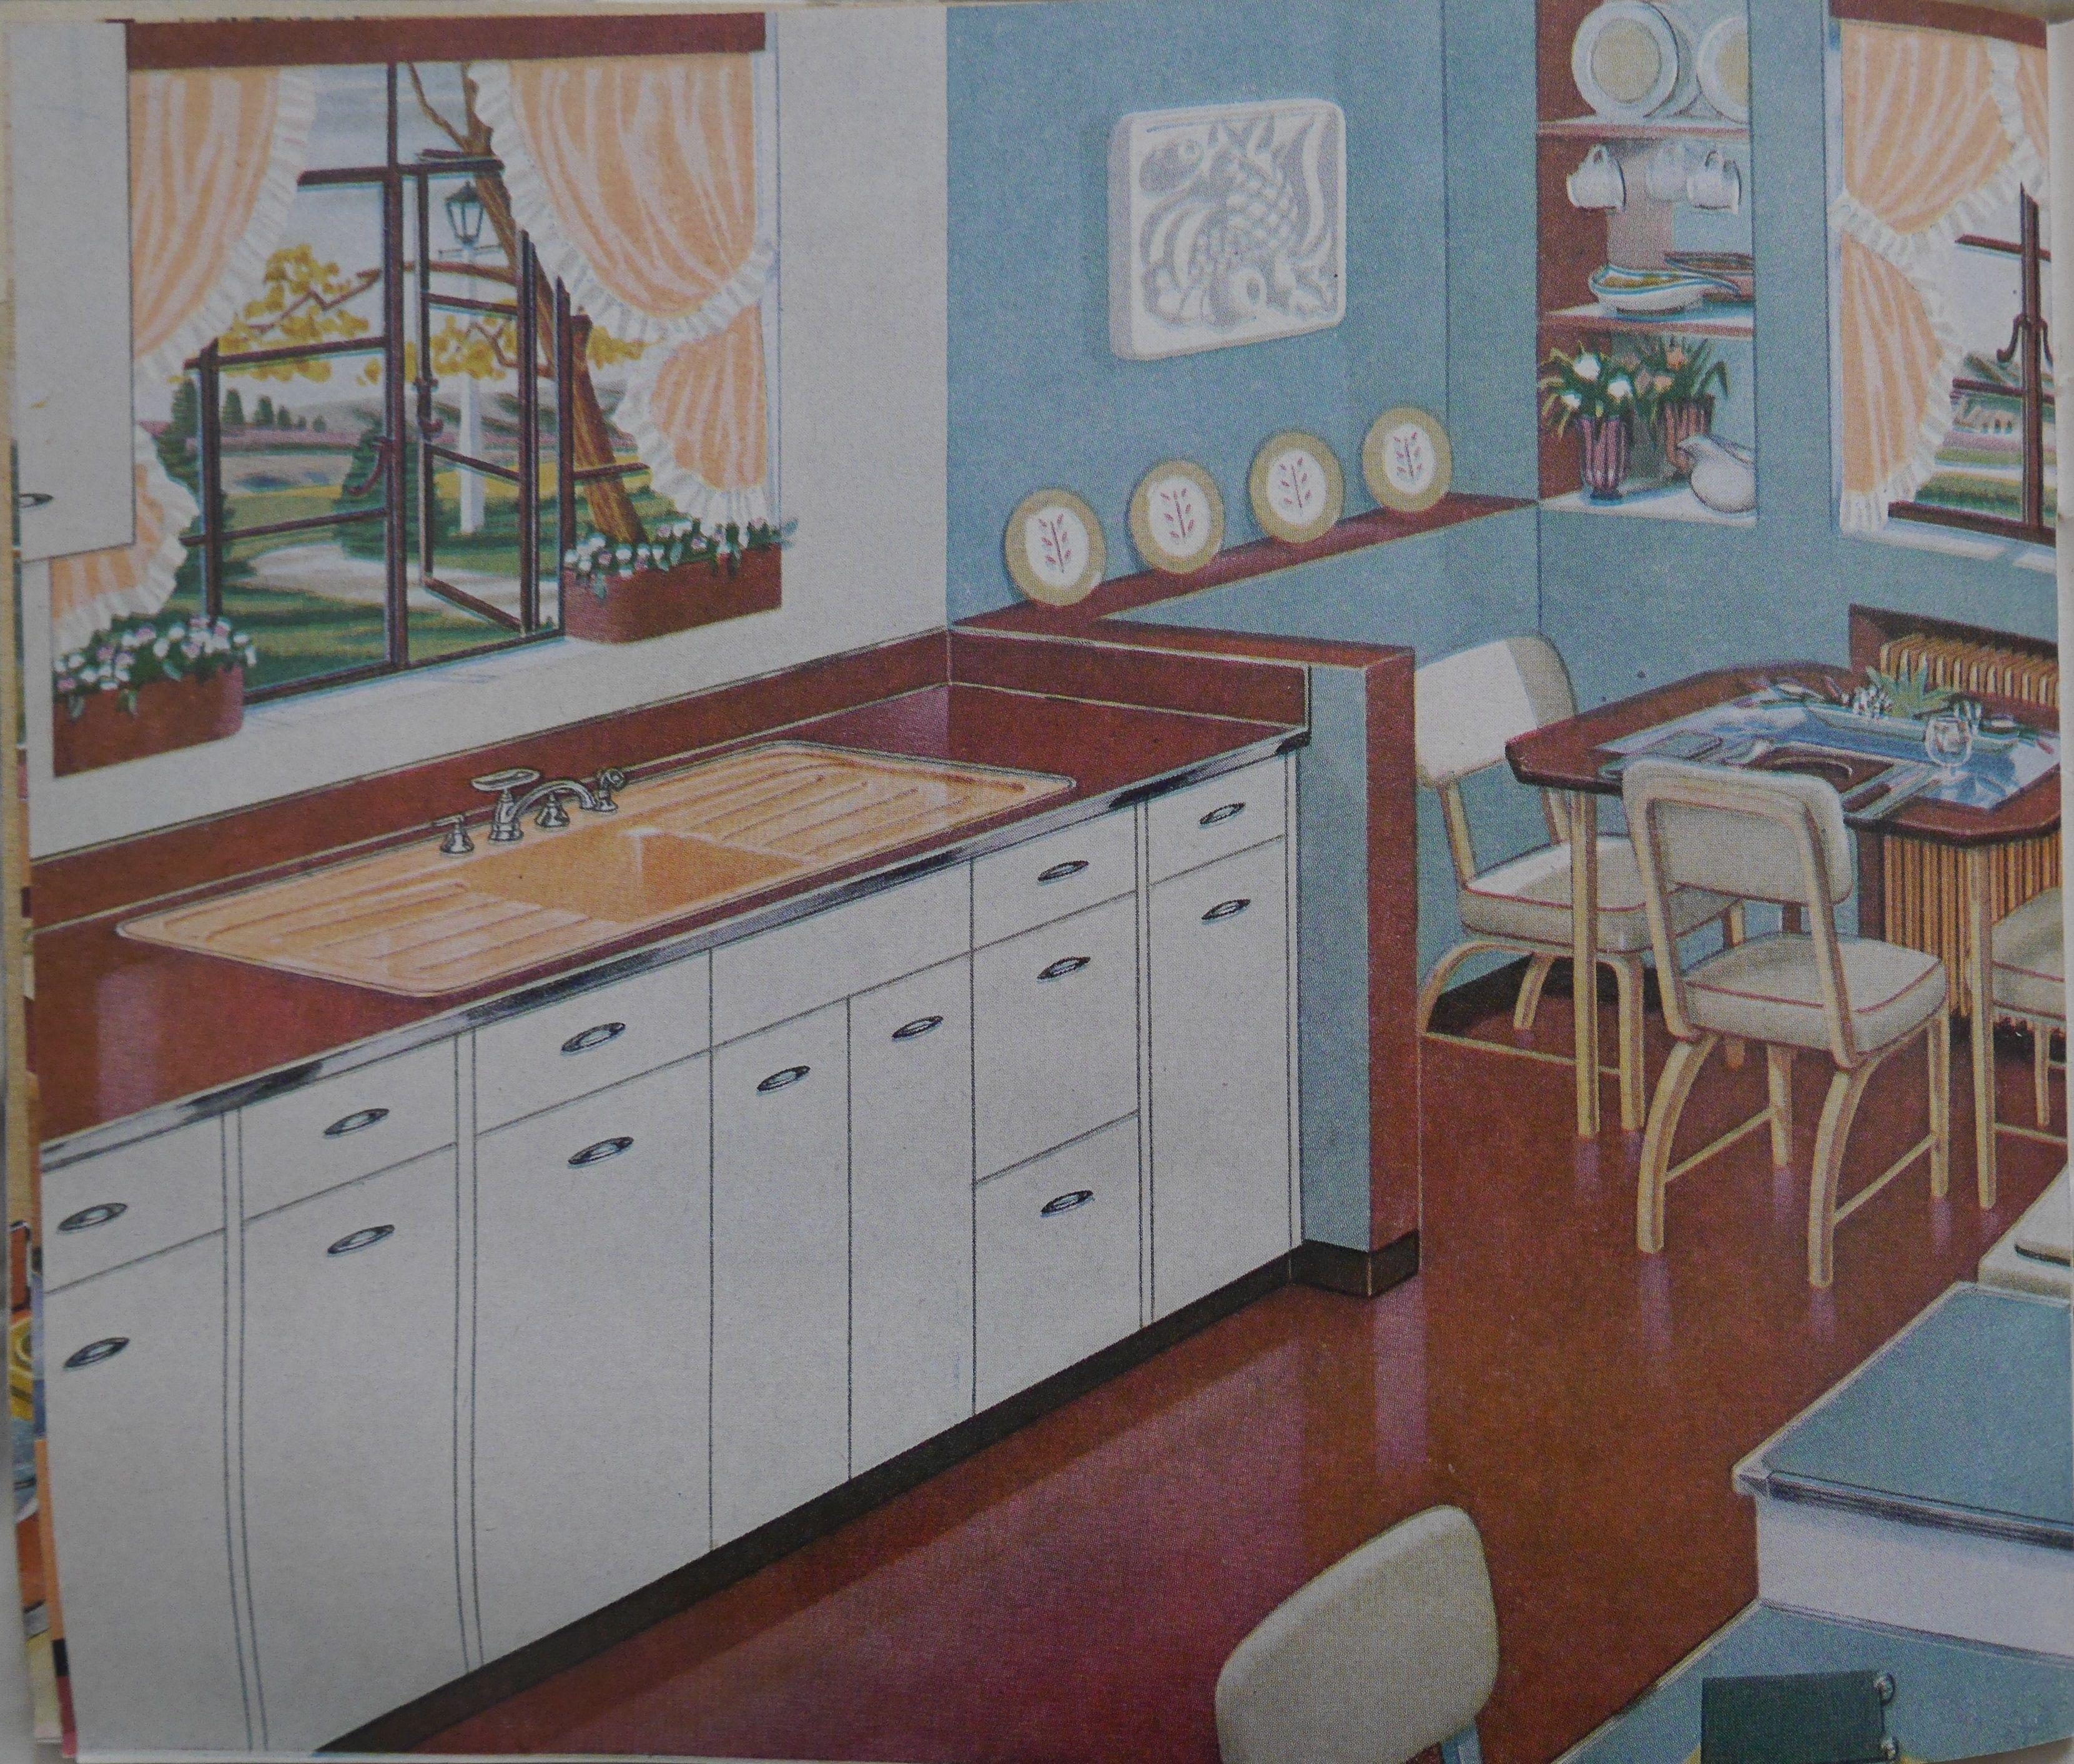 1947 American Standard Kitchen Retro Kitchen Vintage Kitchen Shabby Chic Kitchen